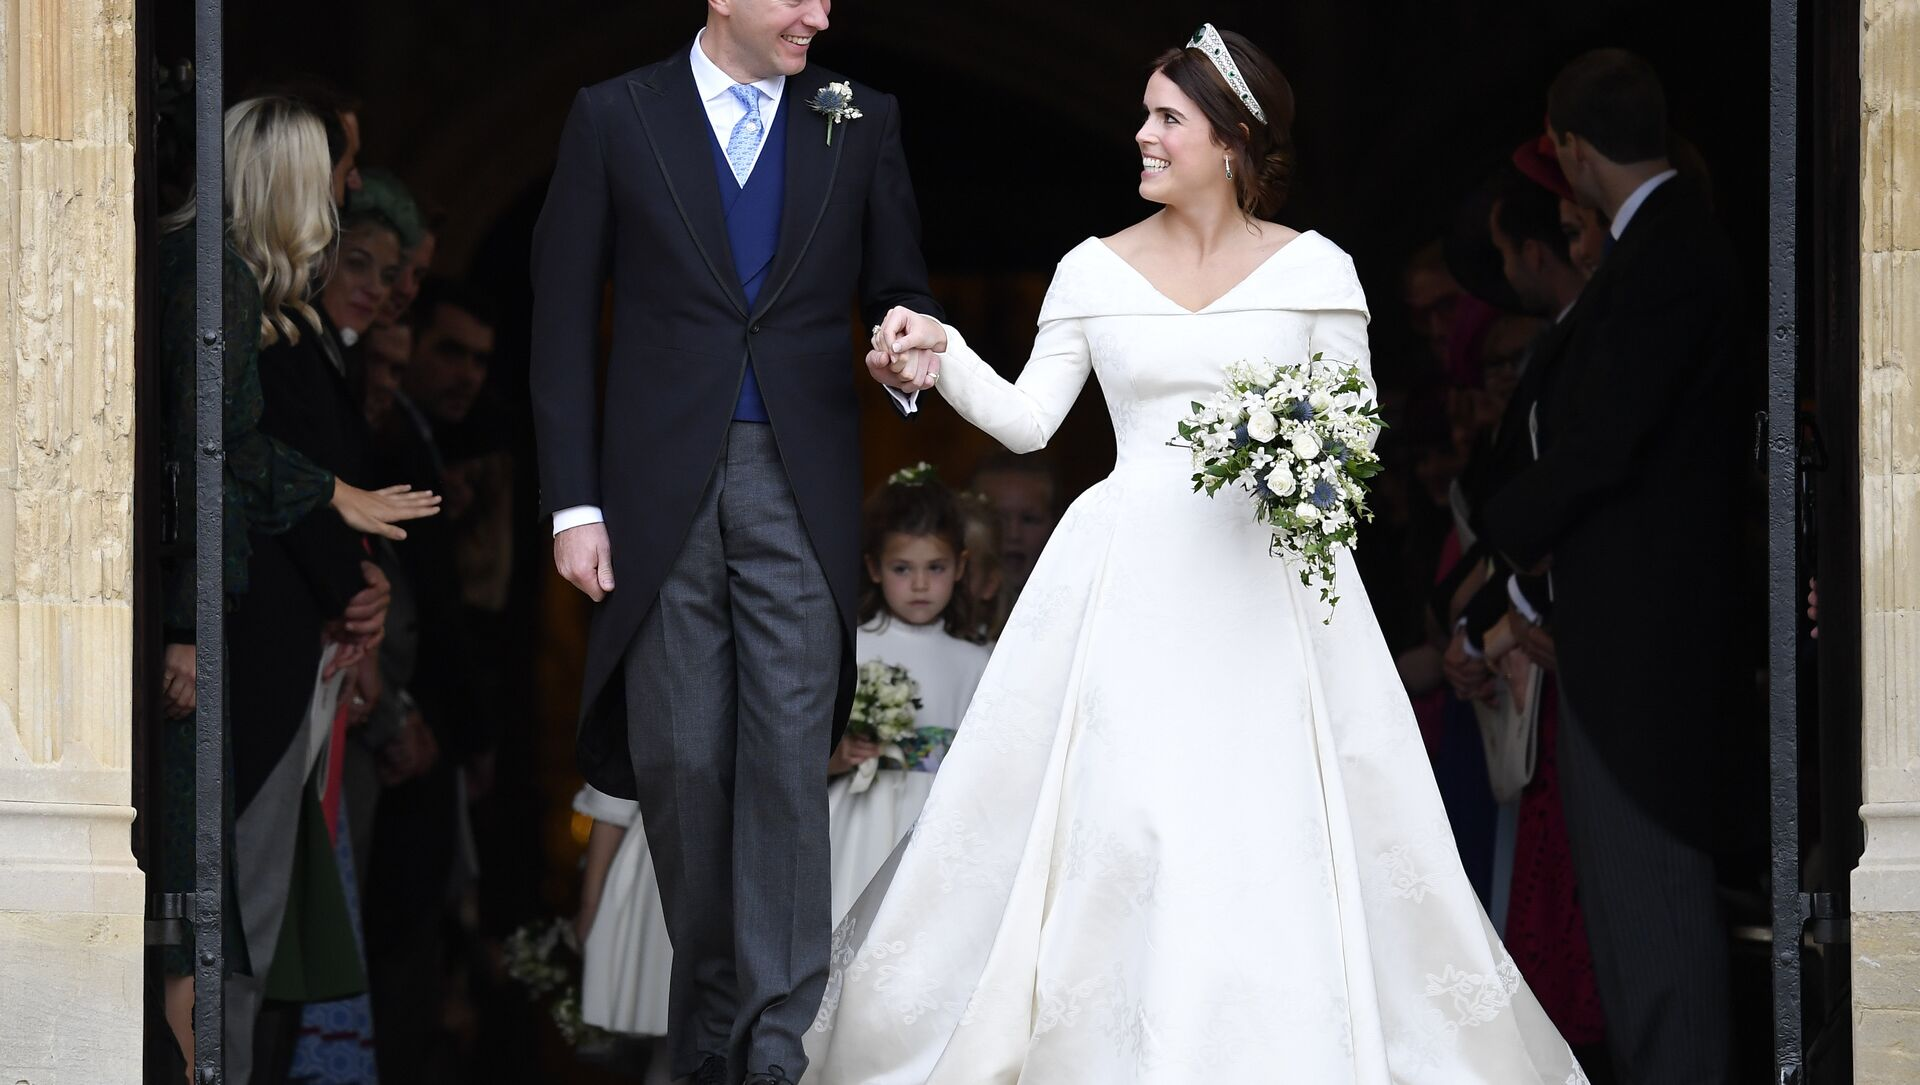 Britain's Princess Eugenie and Jack Brooksbank leave St George's Chapel after their wedding at Windsor Castle, near London, England, Friday Oct. 12, 2018. - Sputnik International, 1920, 01.08.2021